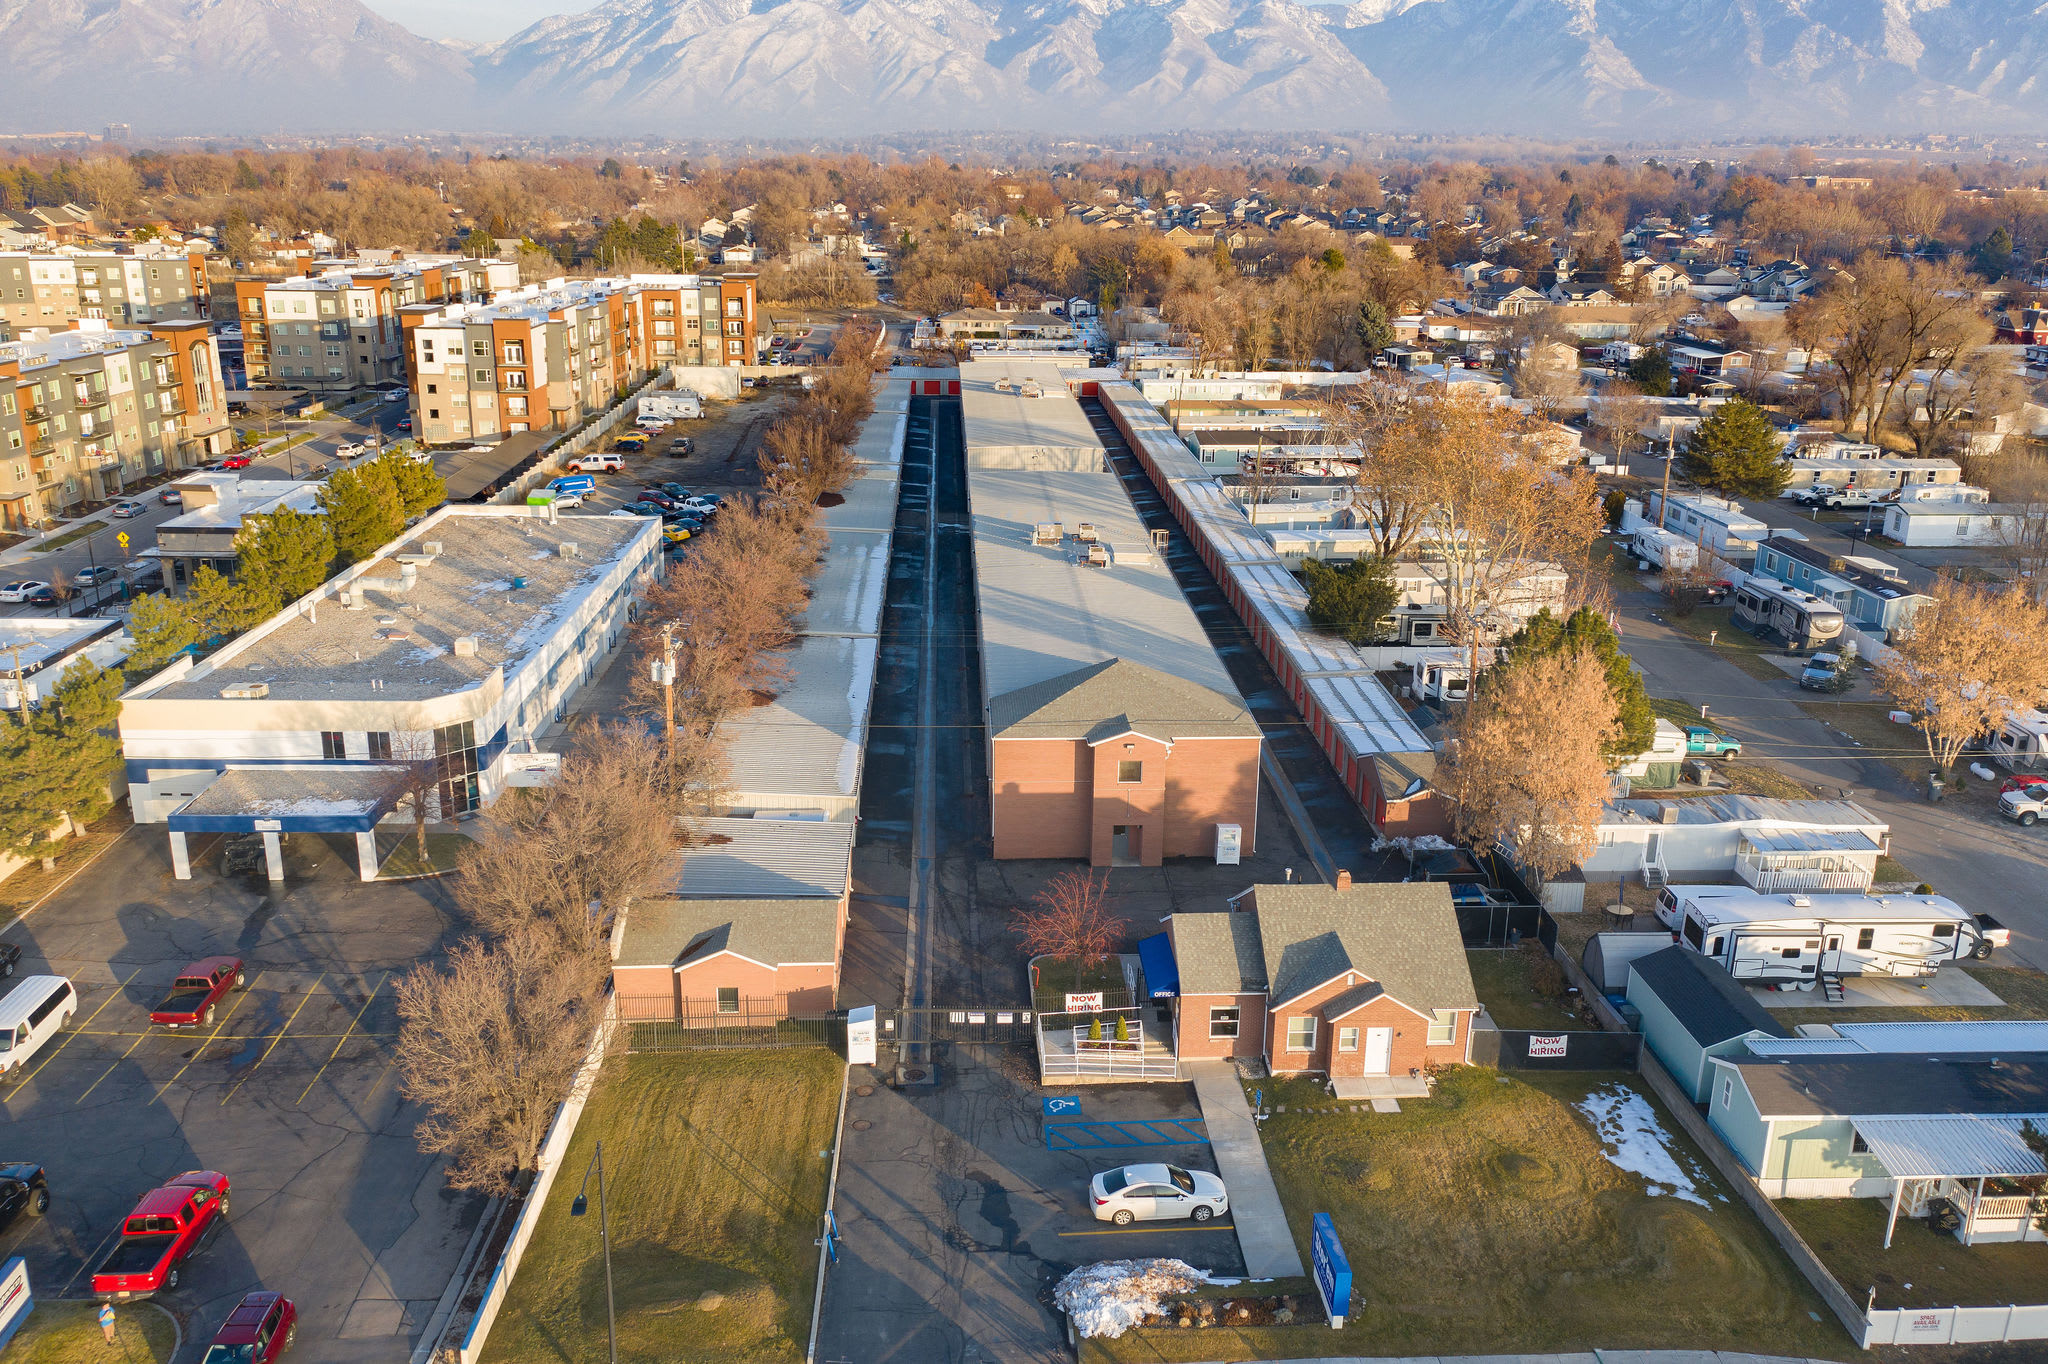 Aerial view at Stor'em Self Storage in Sandy, Utah